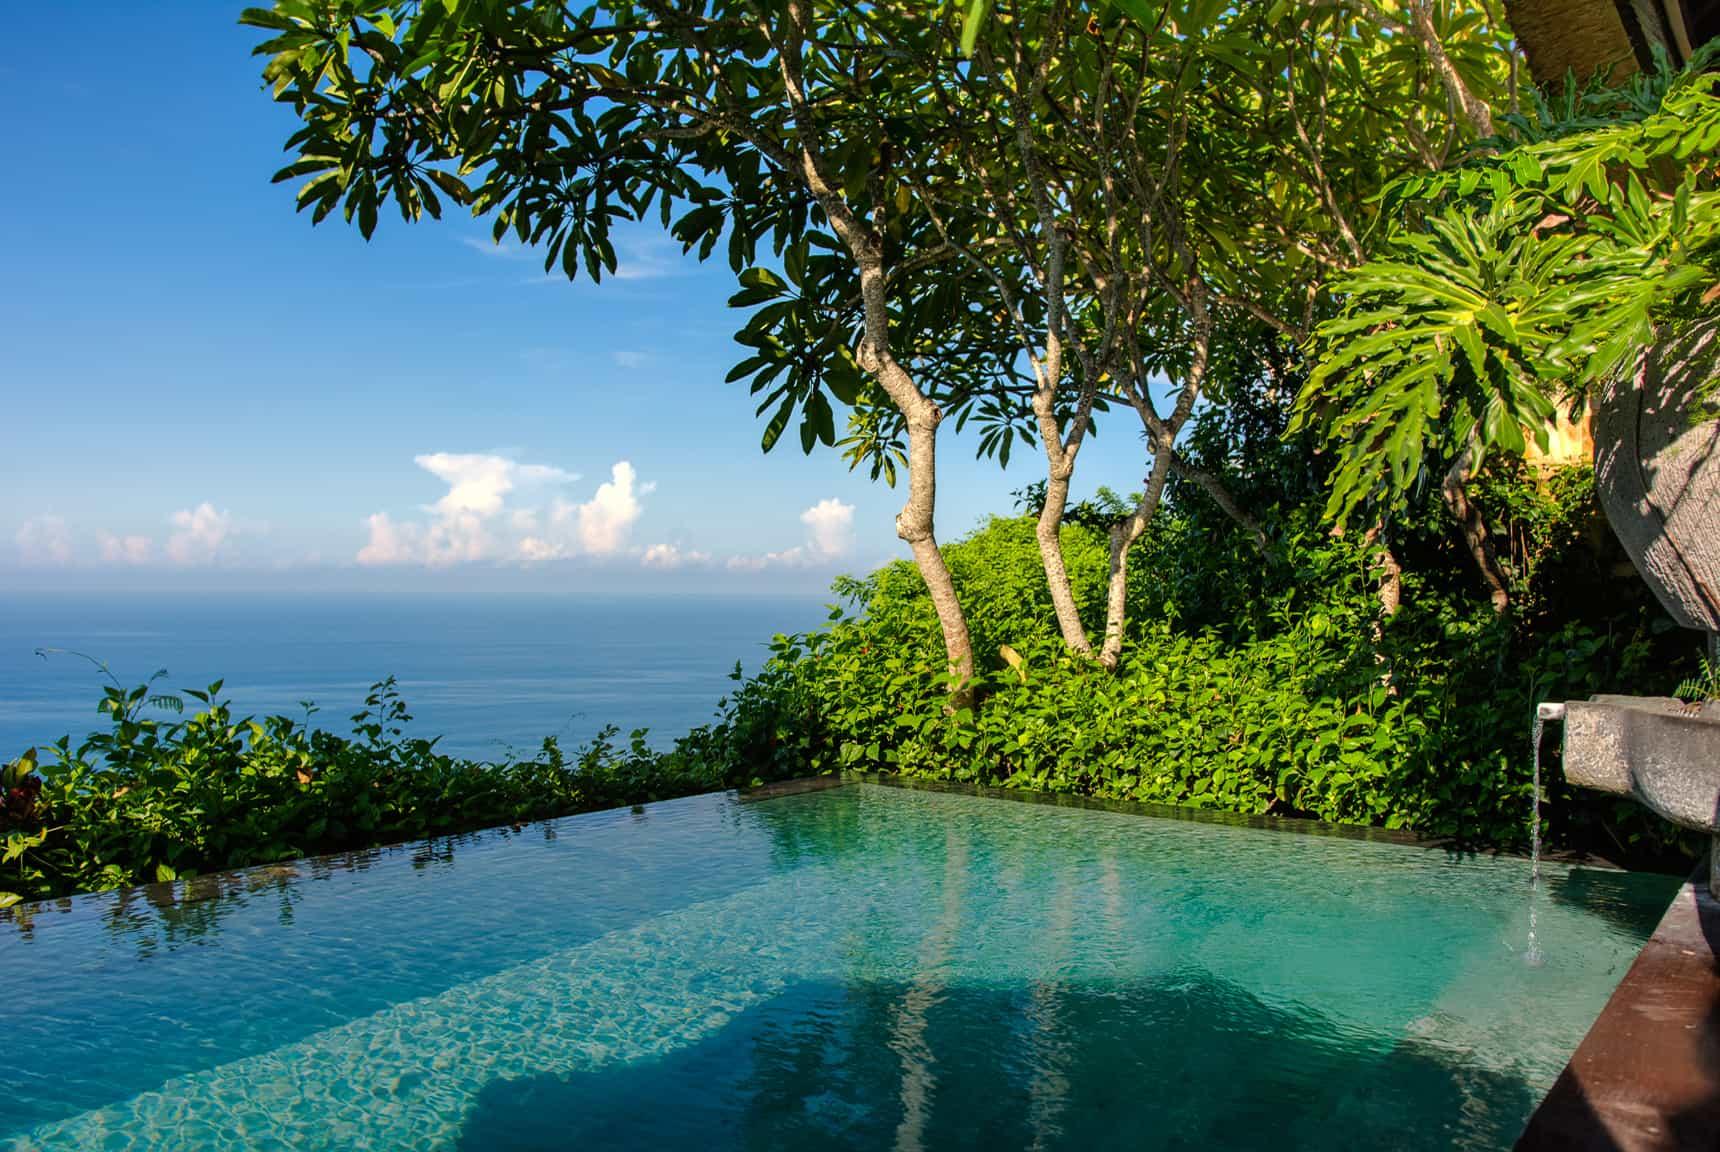 Bali Hotel Photography Bulgari Resort Uluwatu Bali